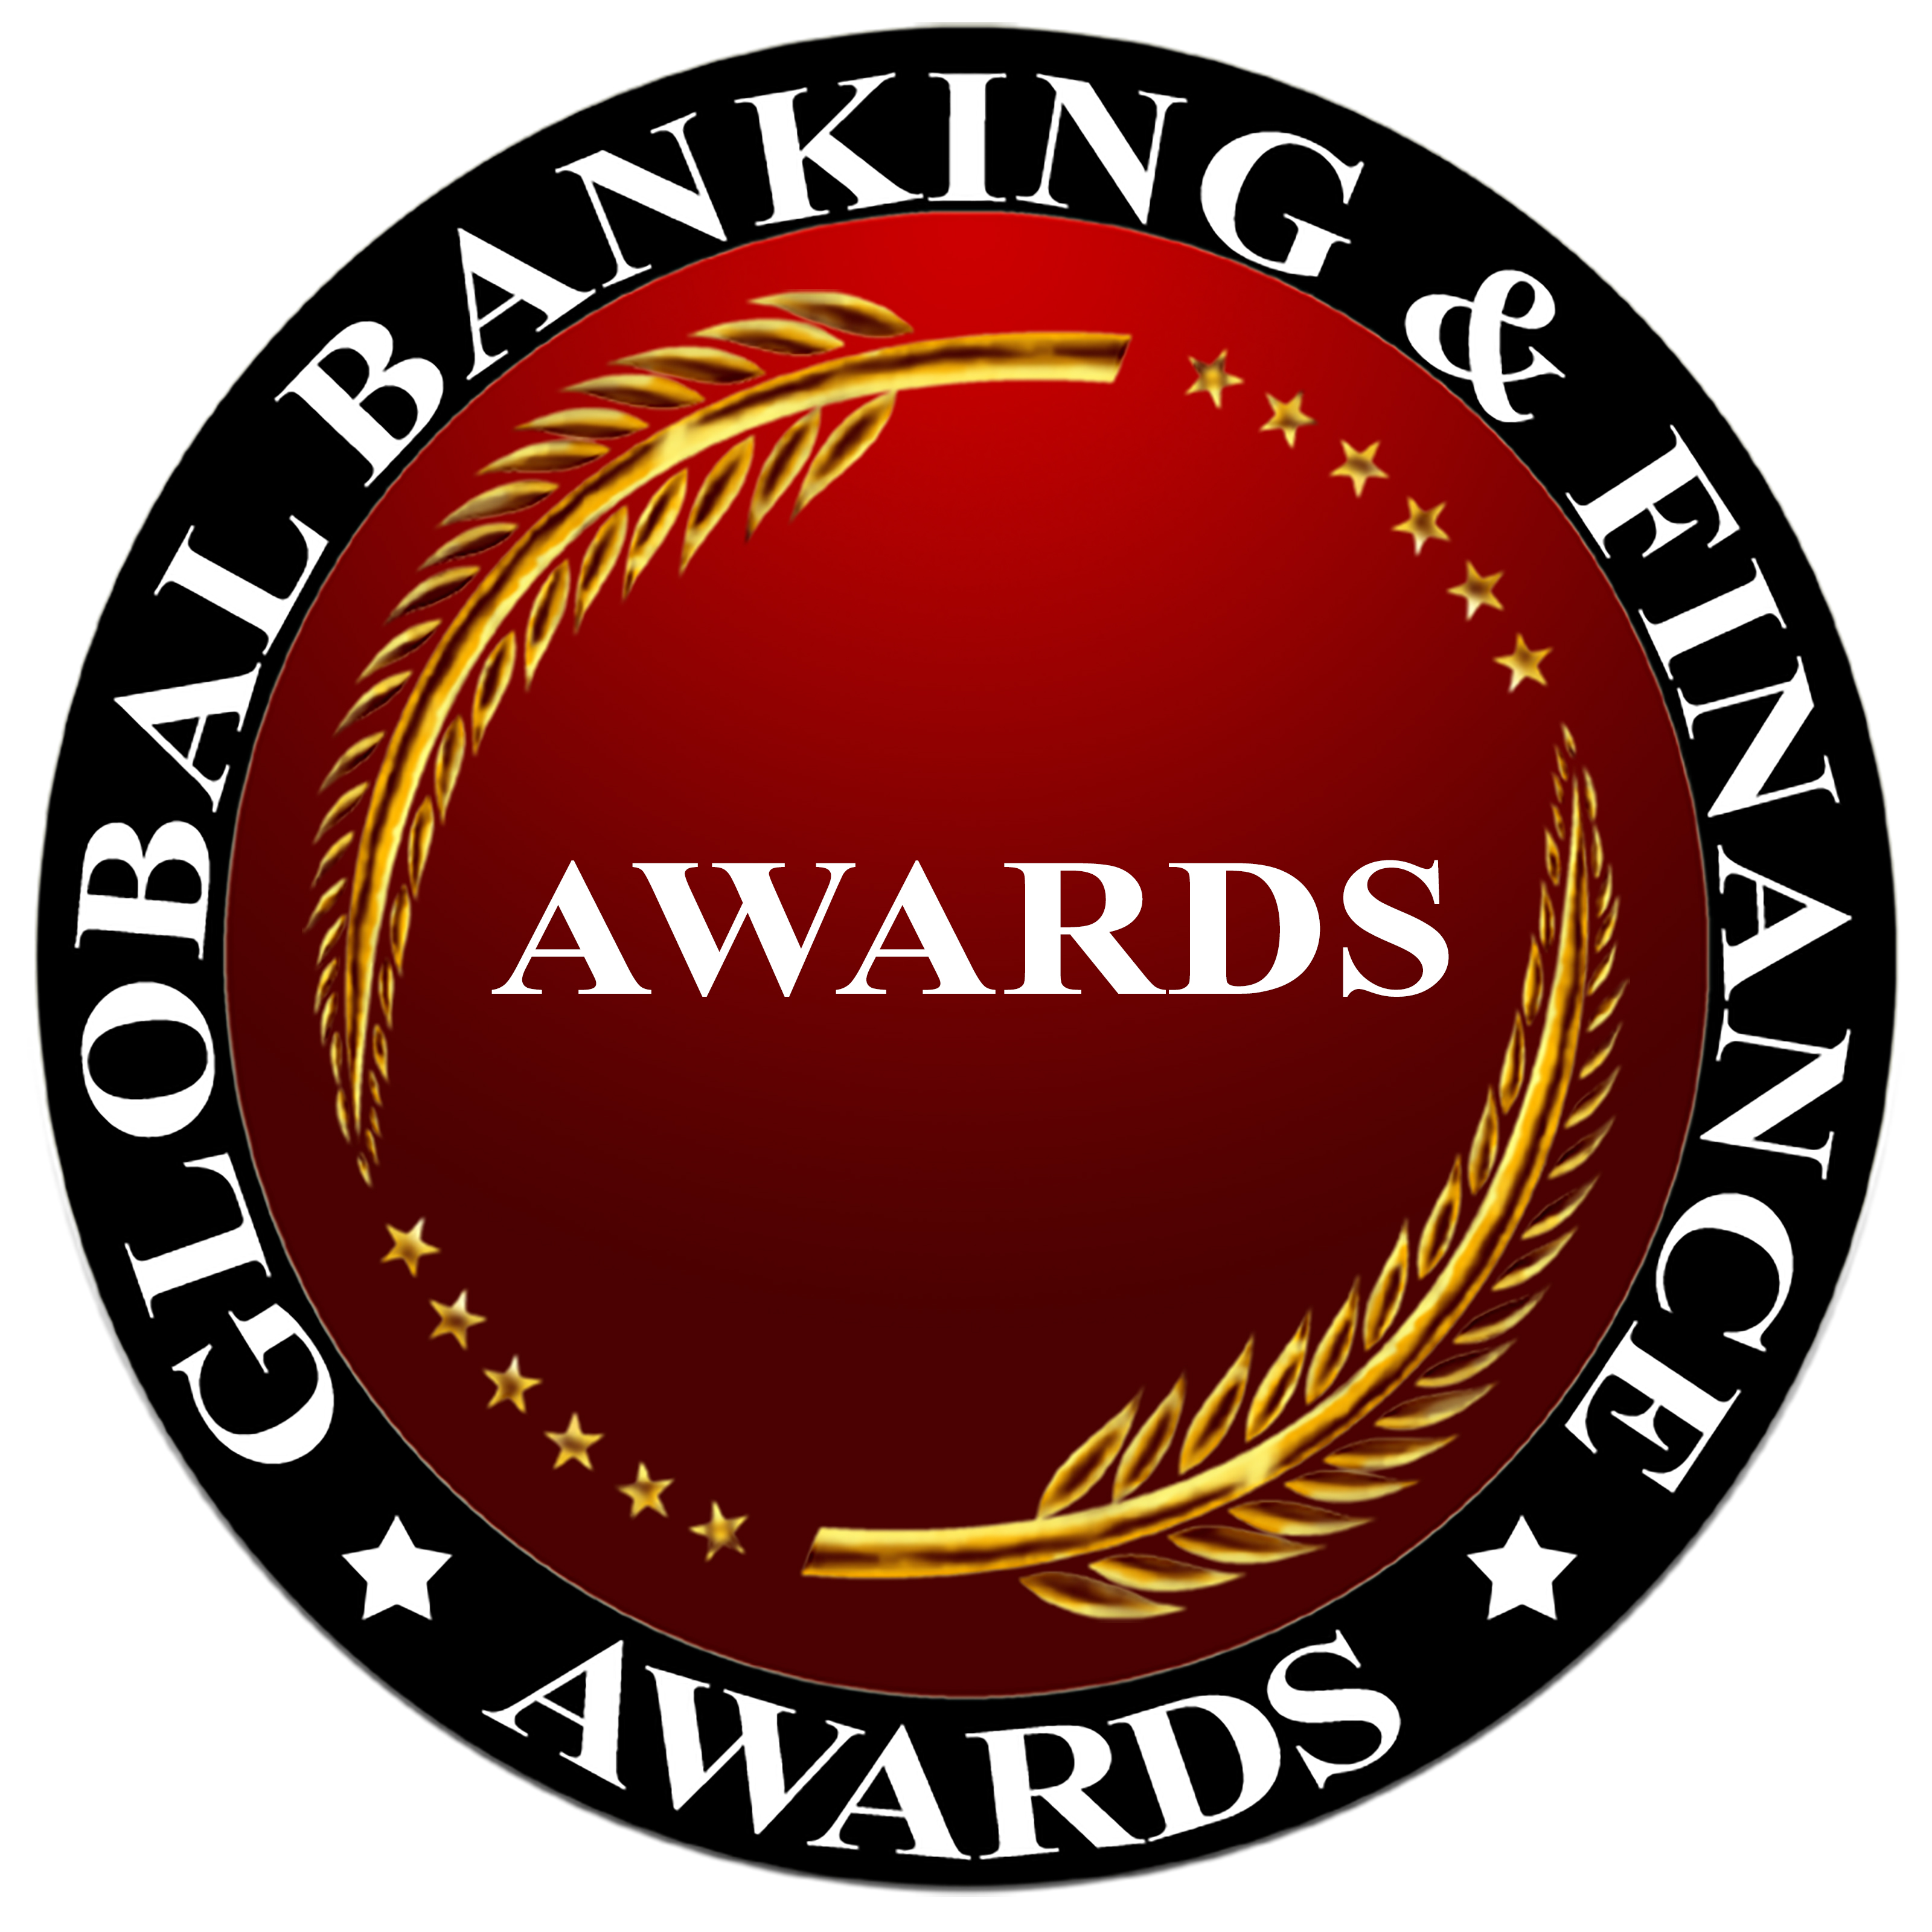 Global Banking & Finance Awards - Wikipedia